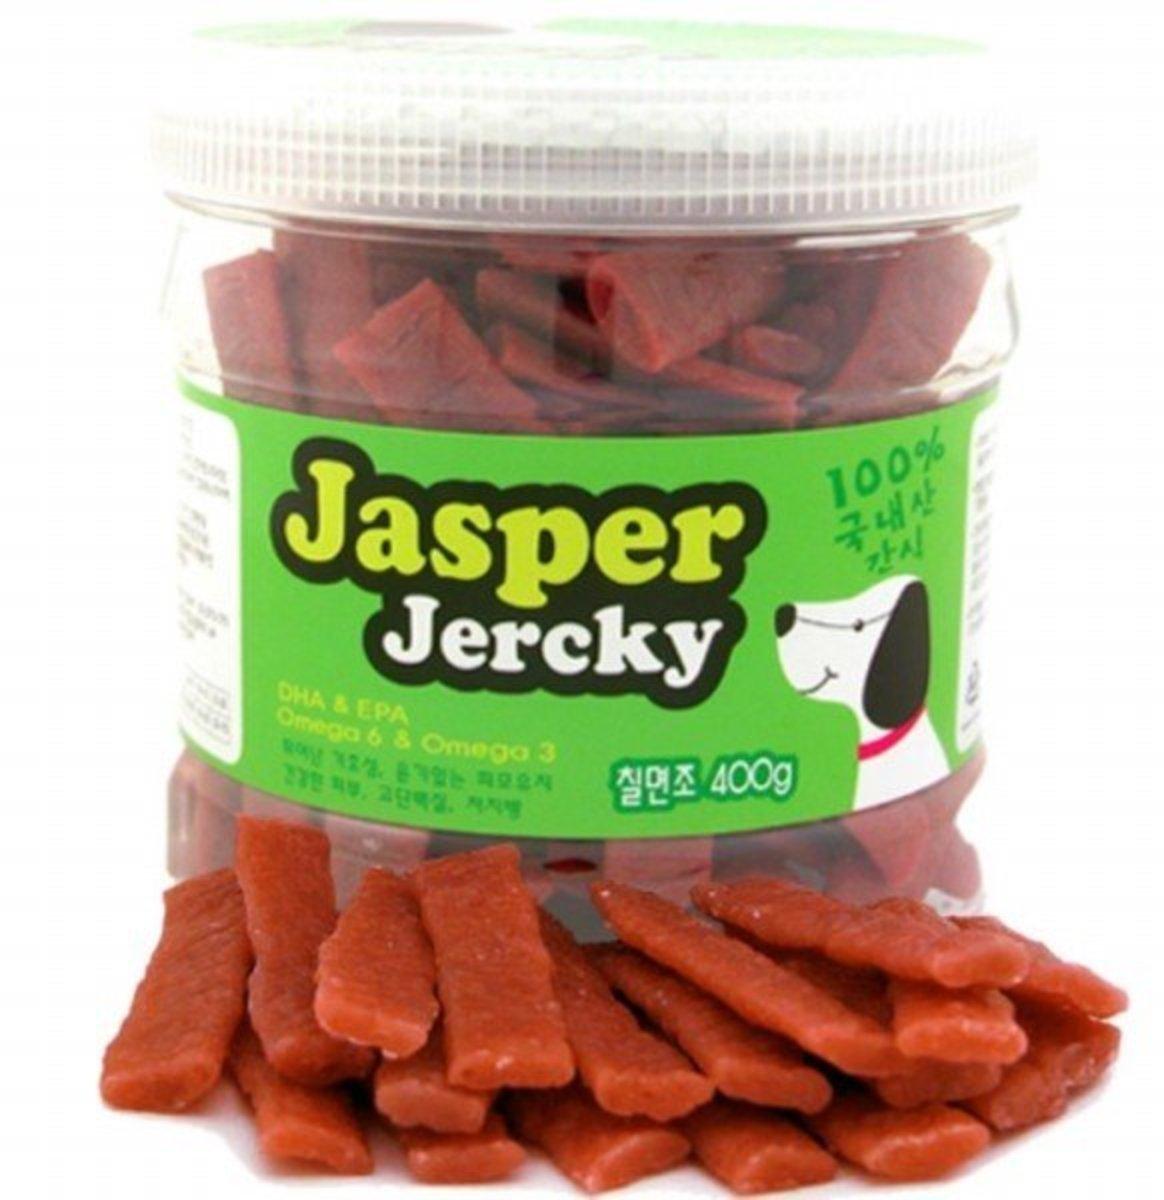 JASPER Premium Pet Food Turkey Jerky-100% Natural-DHA & EPA -Omega 6 & Omega 3